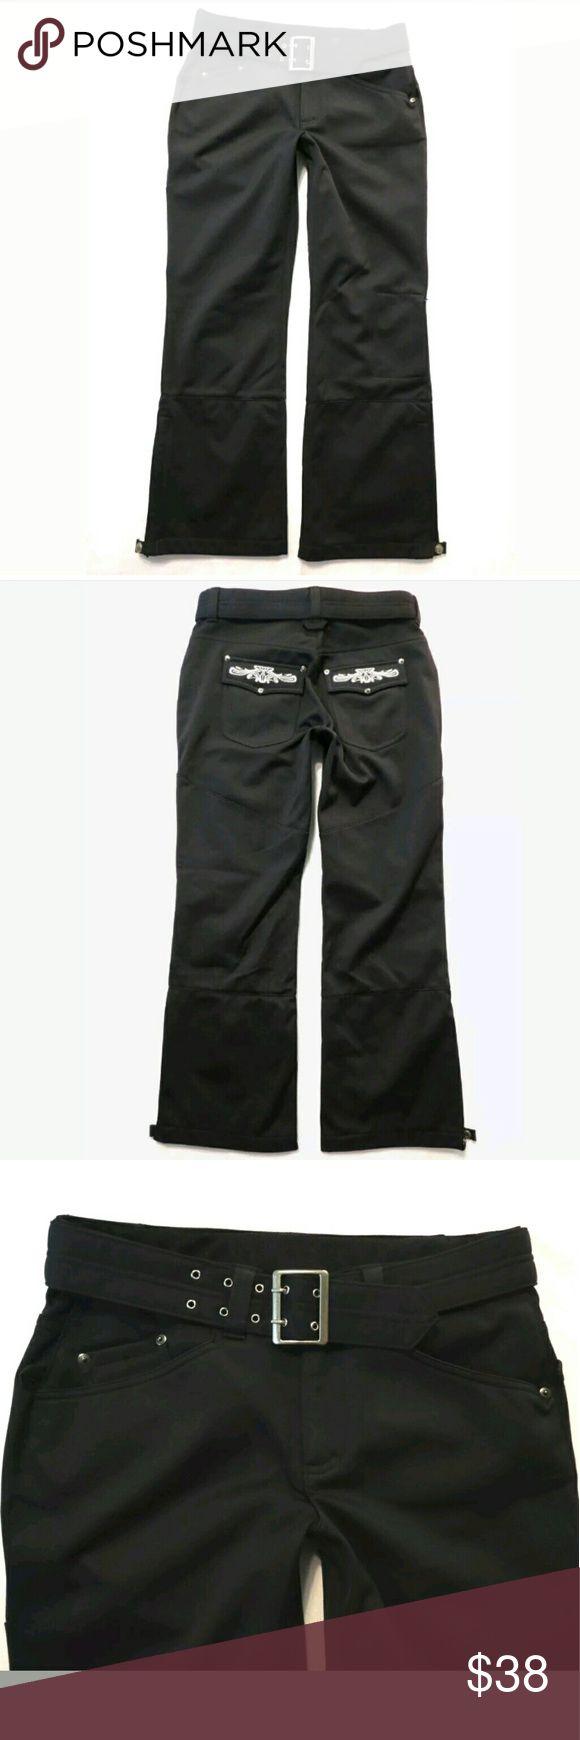 Petite snow shoe pants, pics of worlds biggest dick